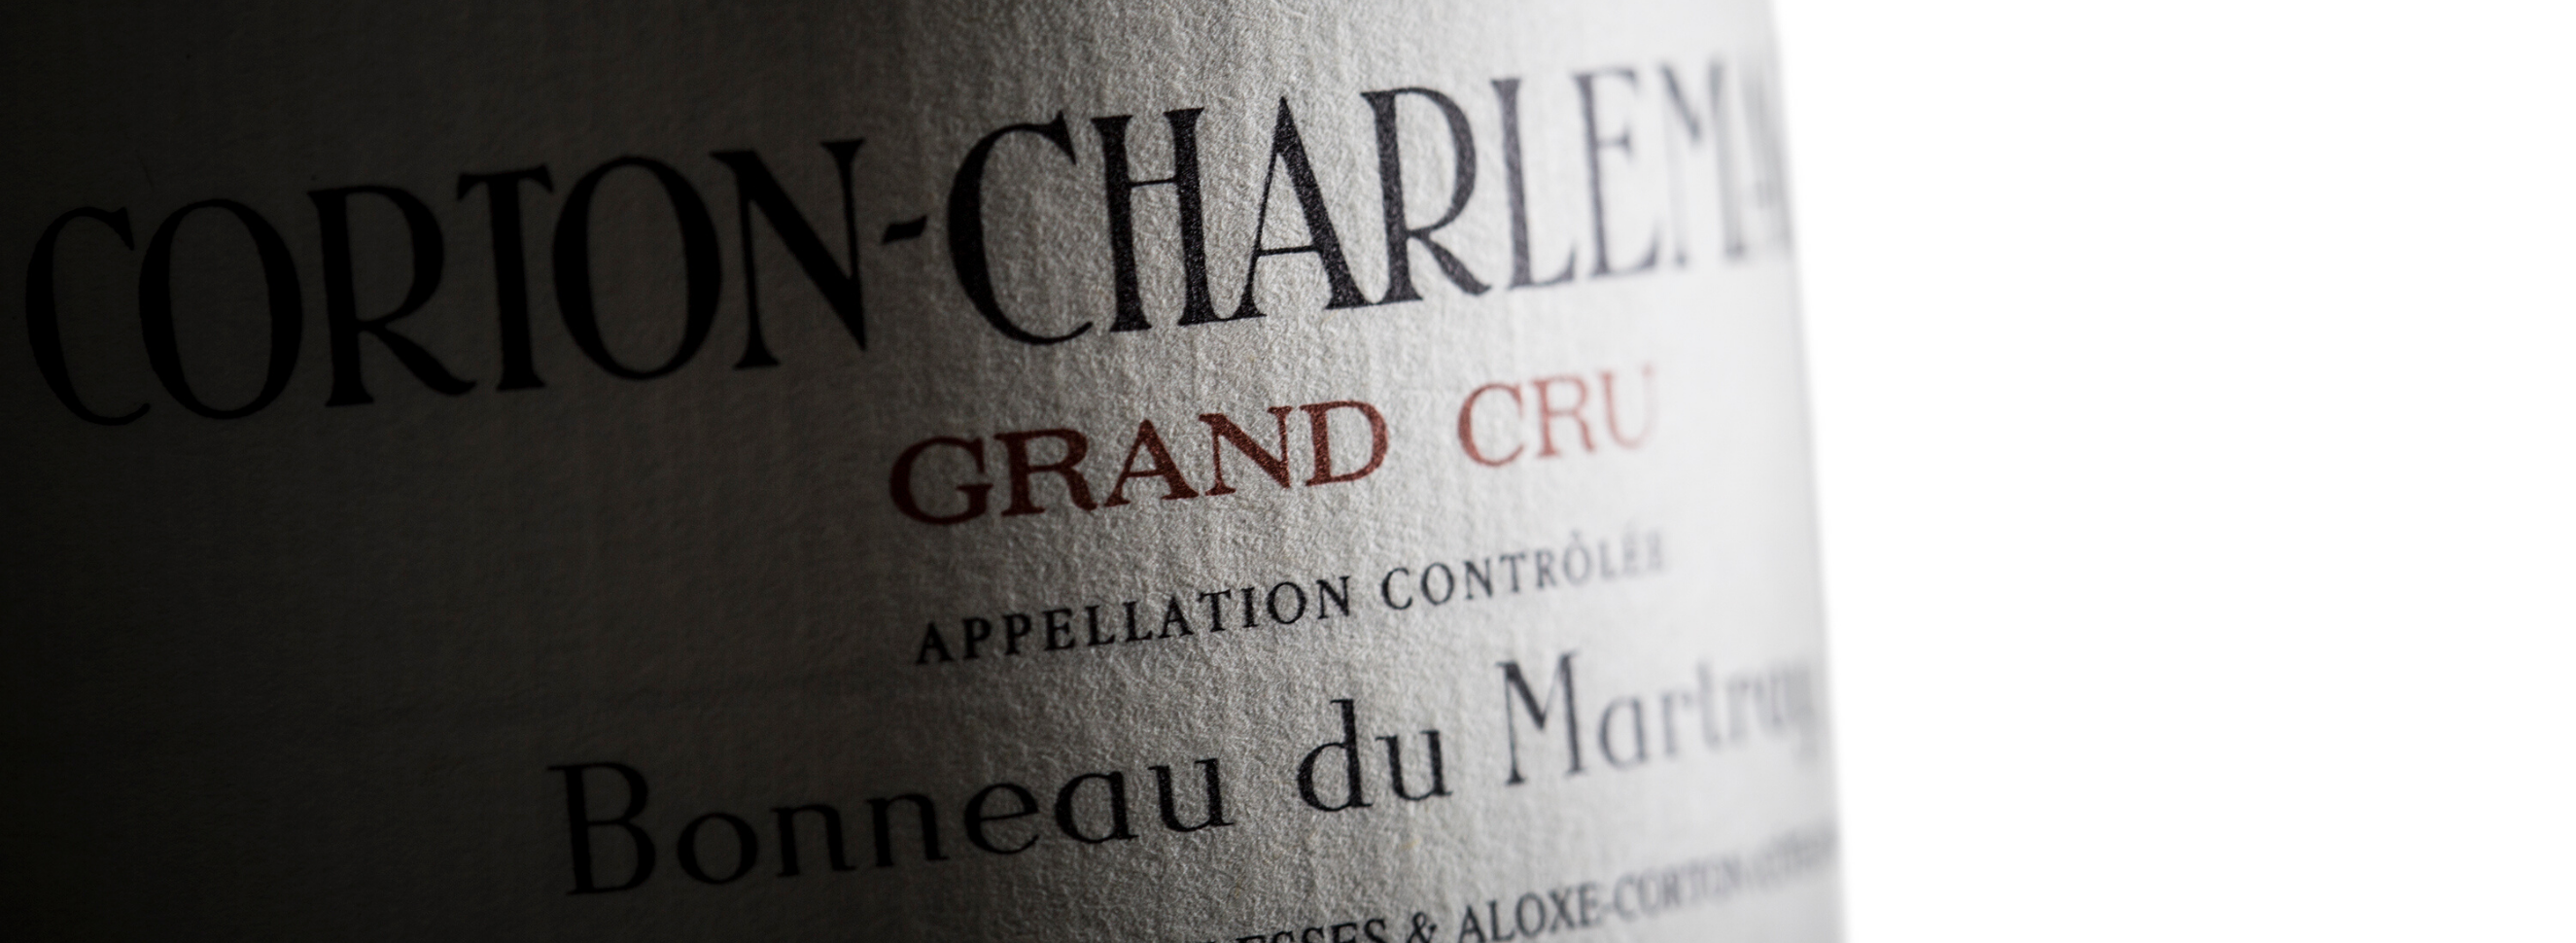 Bonneau du Martray: Thank You Jean-Charles